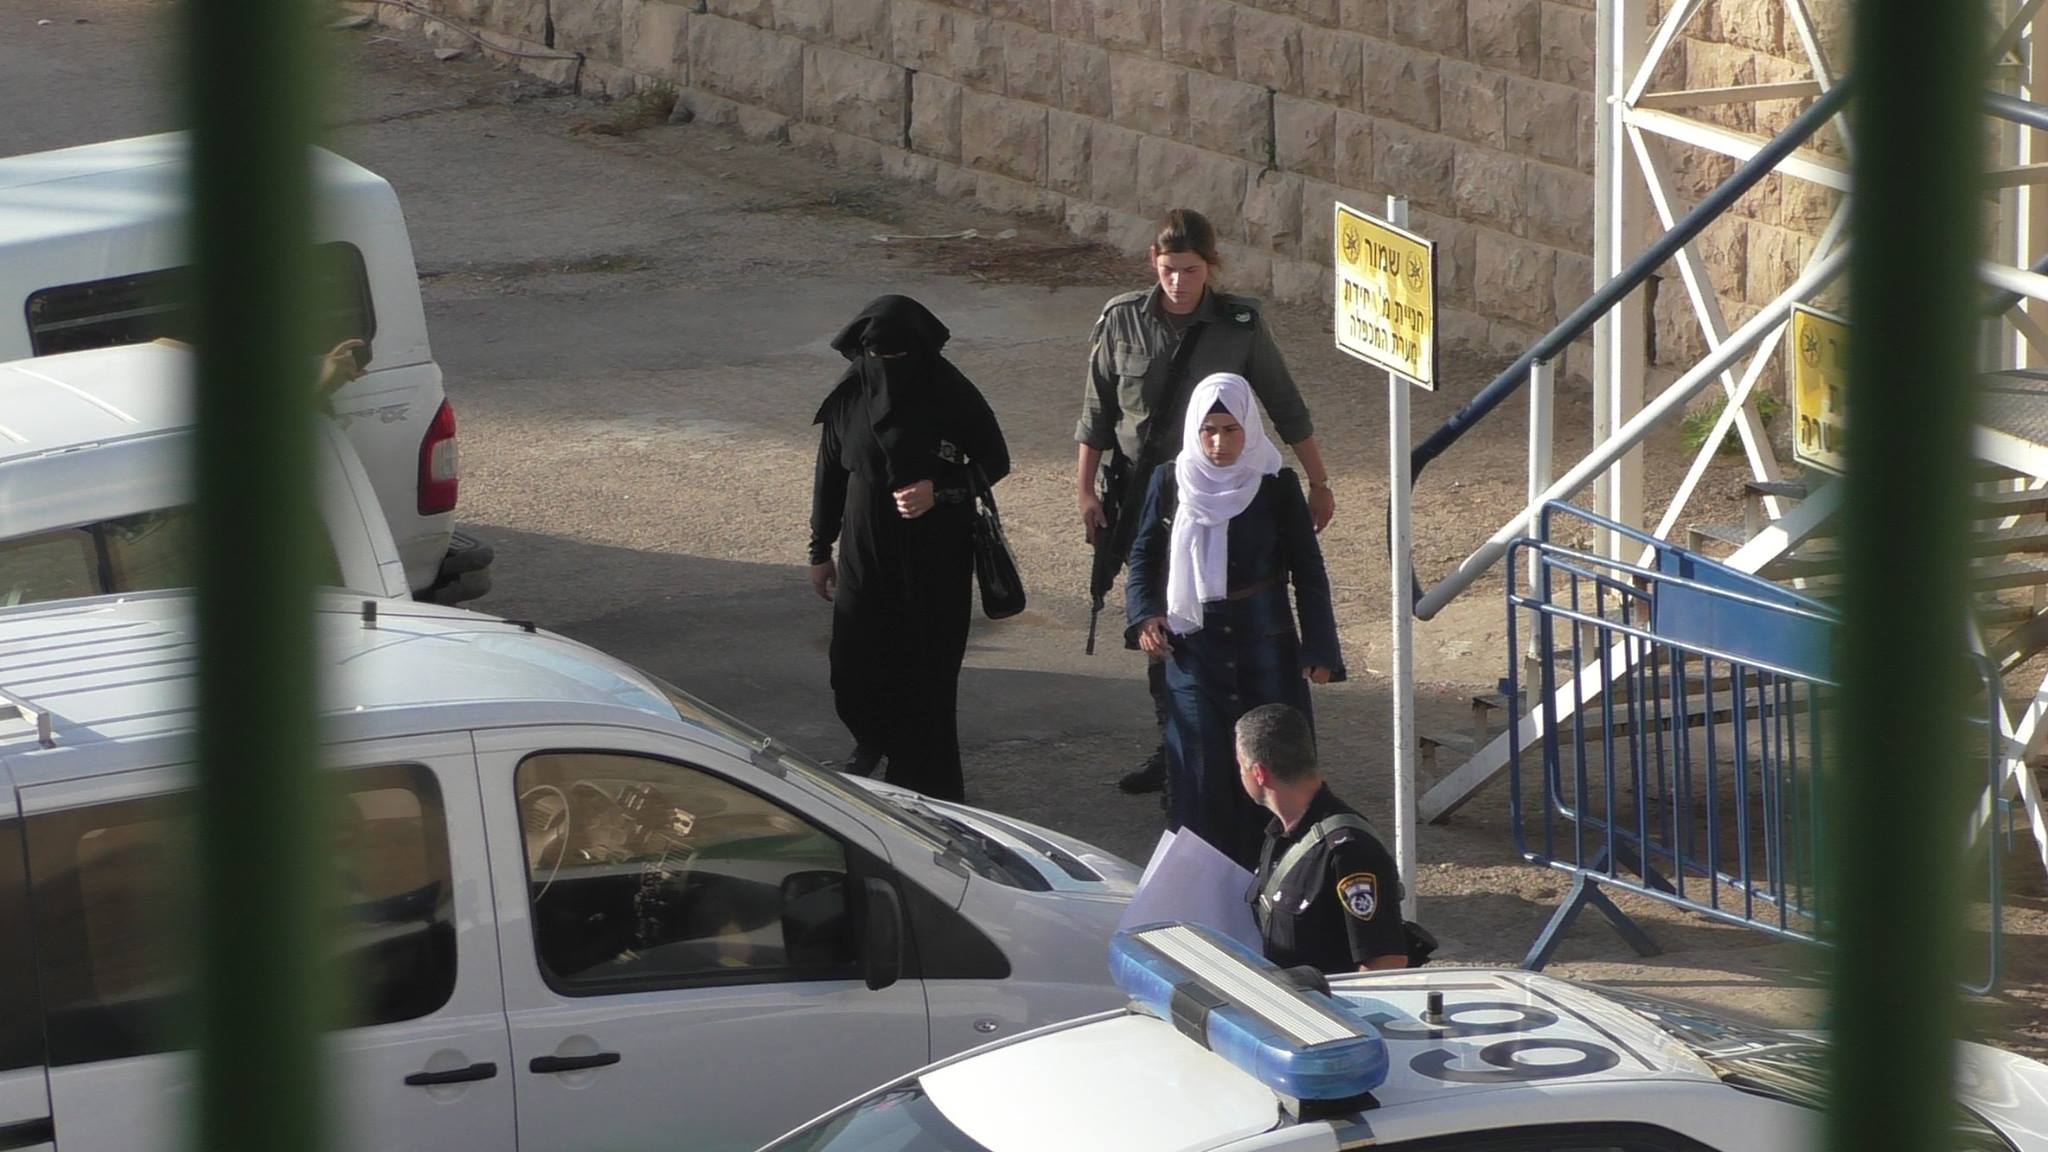 Israeli prison guards arrest mother of Palestinian detainee